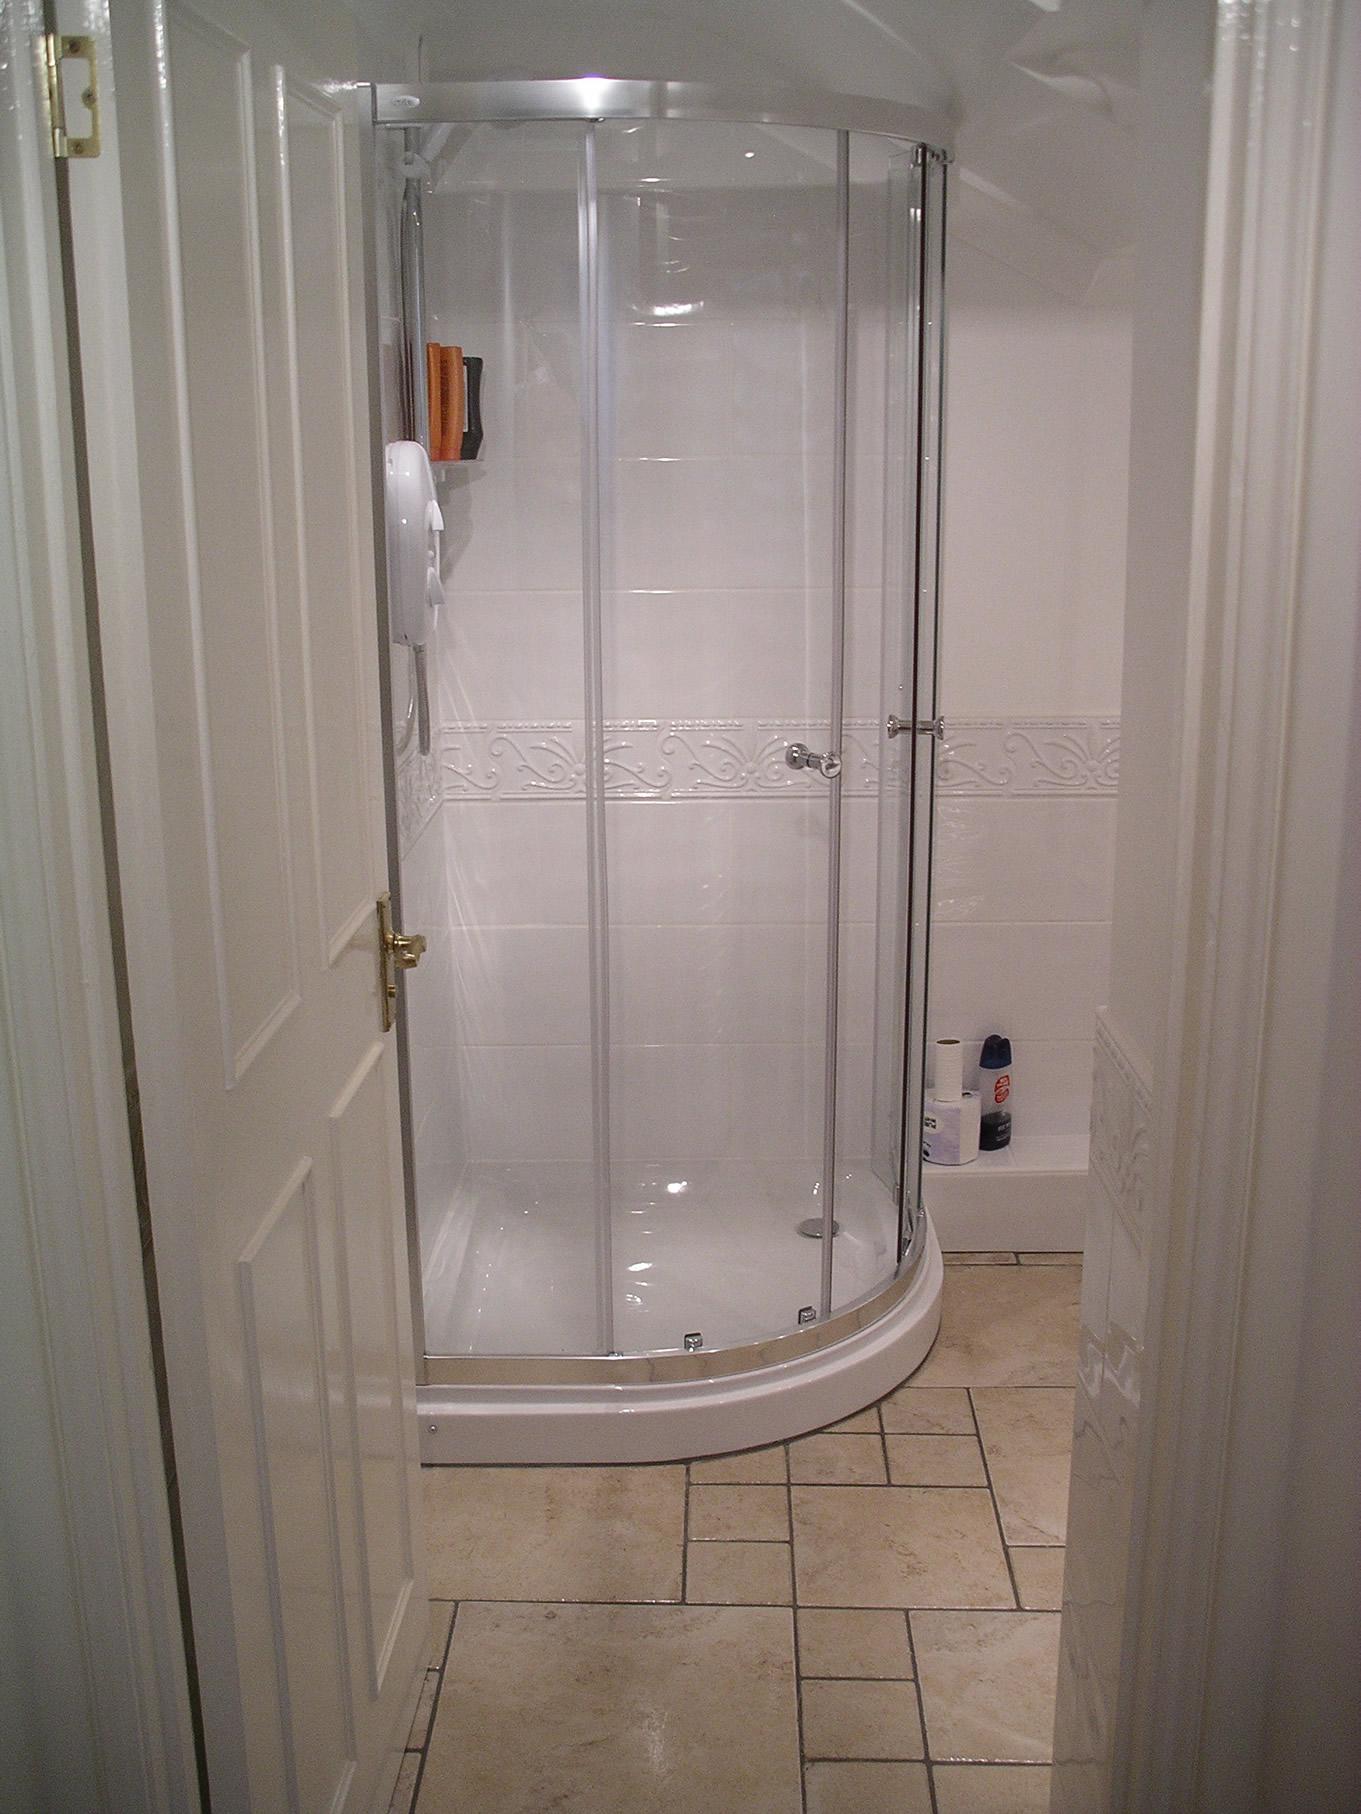 Tile Shower Room